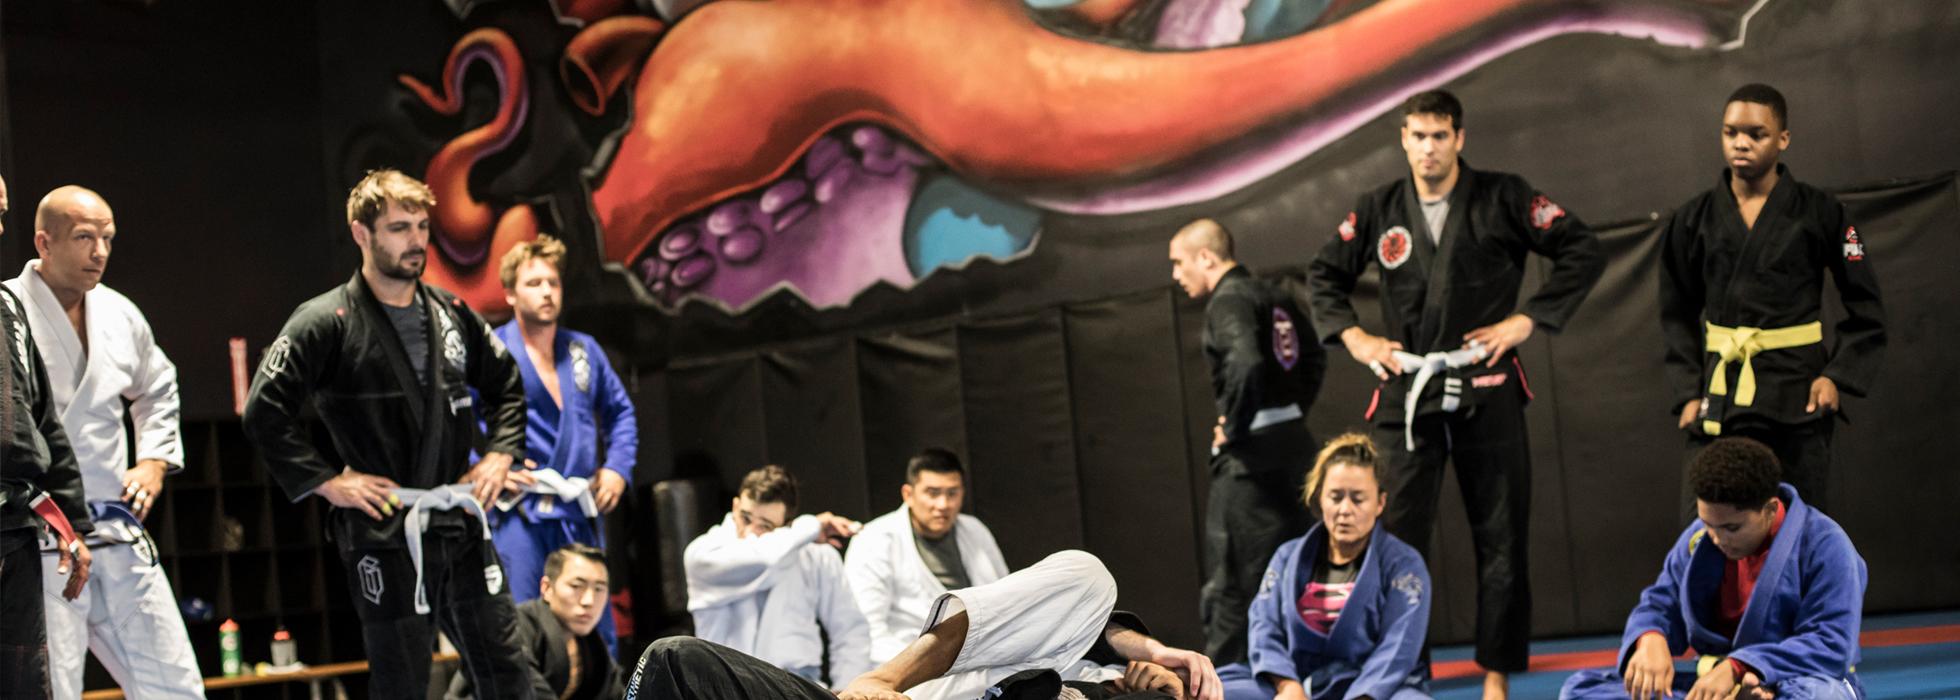 Jiu-Jitsu, Muay Thai and Boxing Facility near Atlanta GA, Jiu-Jitsu, Muay Thai and Boxing Facility near Cartersville GA, Jiu-Jitsu, Muay Thai and Boxing Facility near Chamblee GA, Jiu-Jitsu, Muay Thai and Boxing Facility near Midtown Atlanta GA, Jiu-Jitsu, Muay Thai and Boxing Facility near Sandy Springs GA, Jiu-Jitsu, Muay Thai and Boxing Facility near Dacula GA